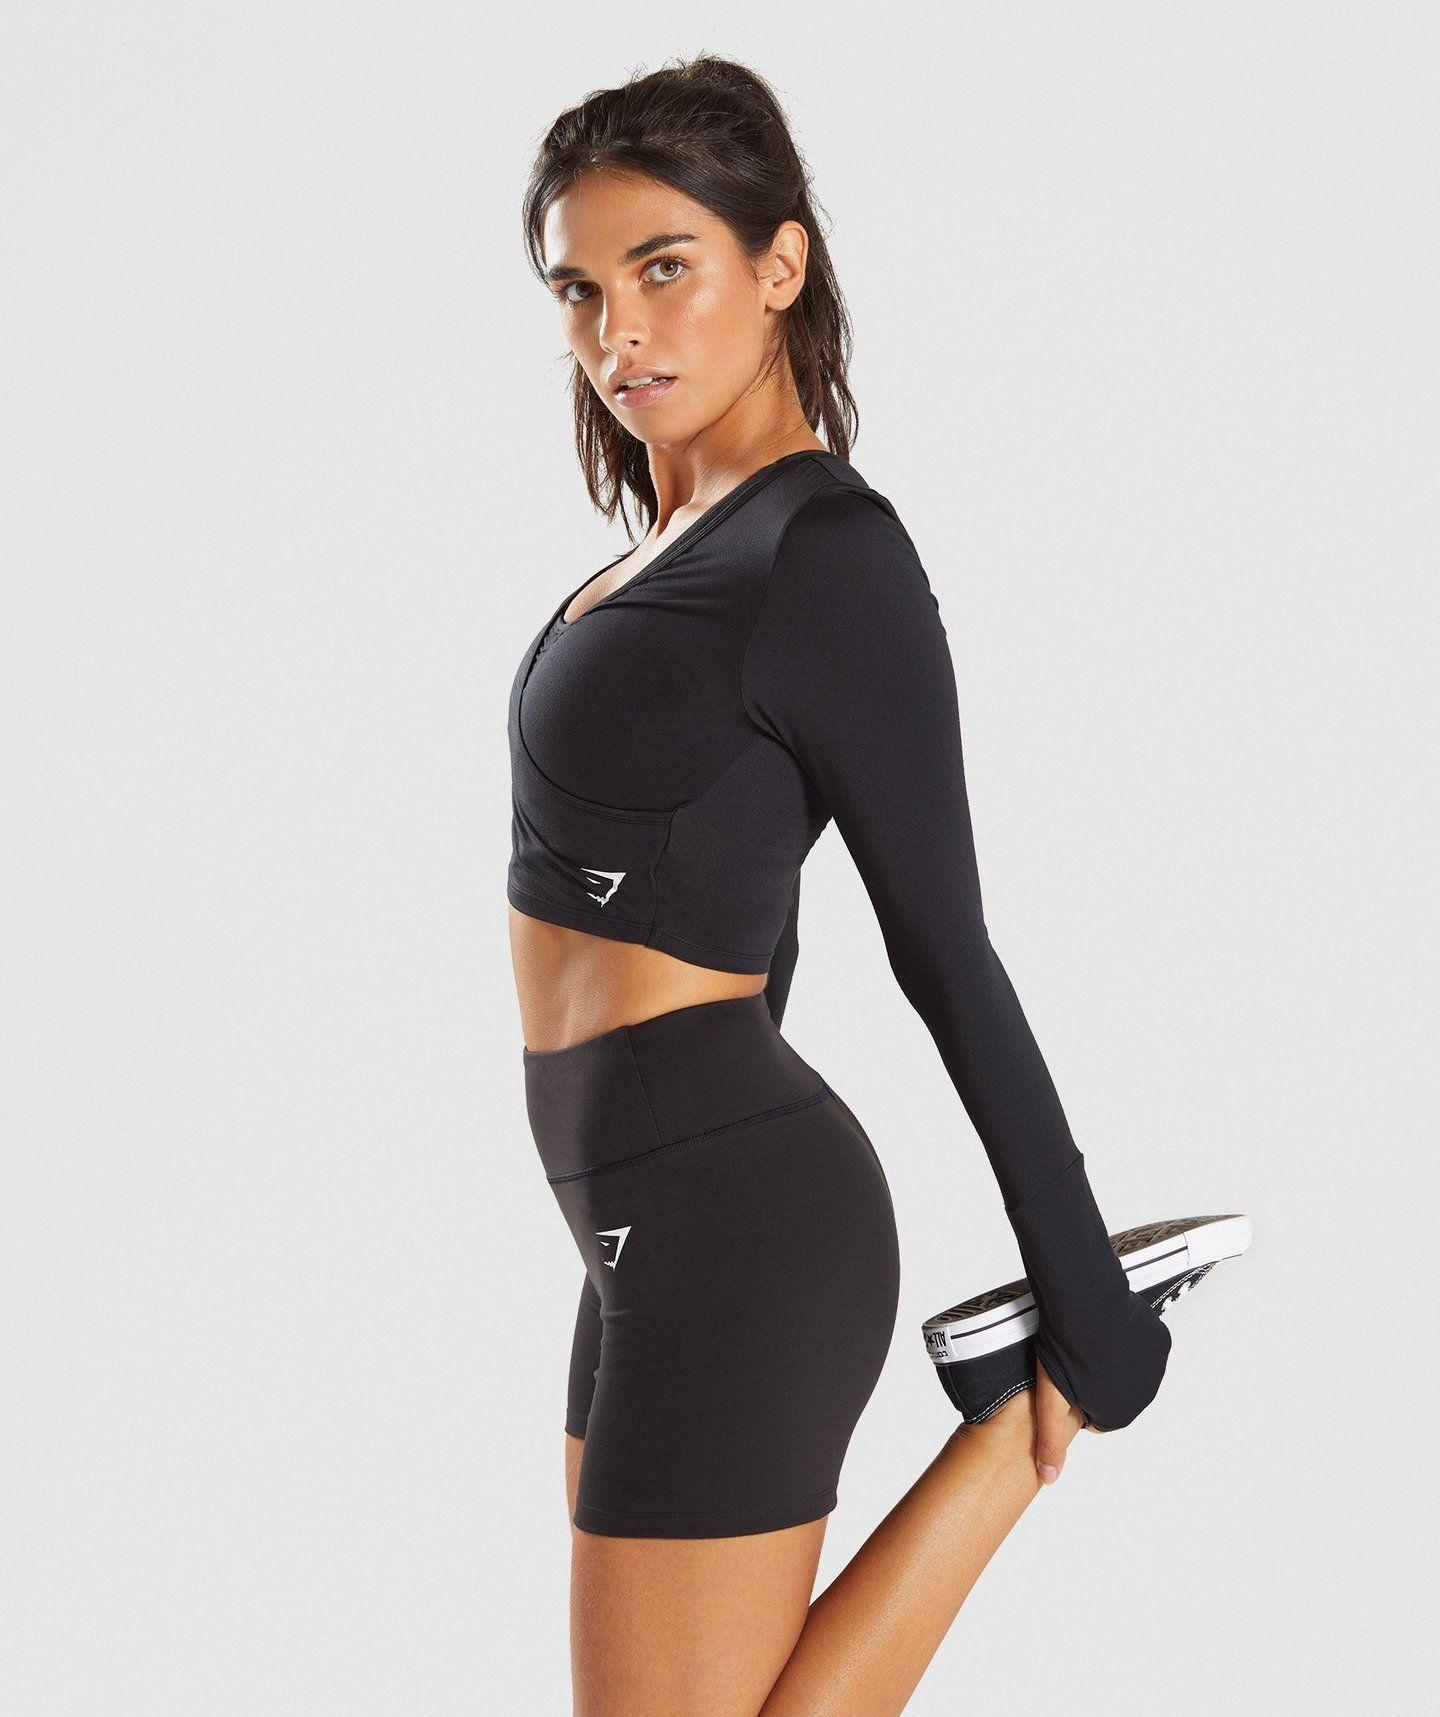 012f8f4bca23c Gymshark Long Sleeve Ballet Crop Top - Black in 2019